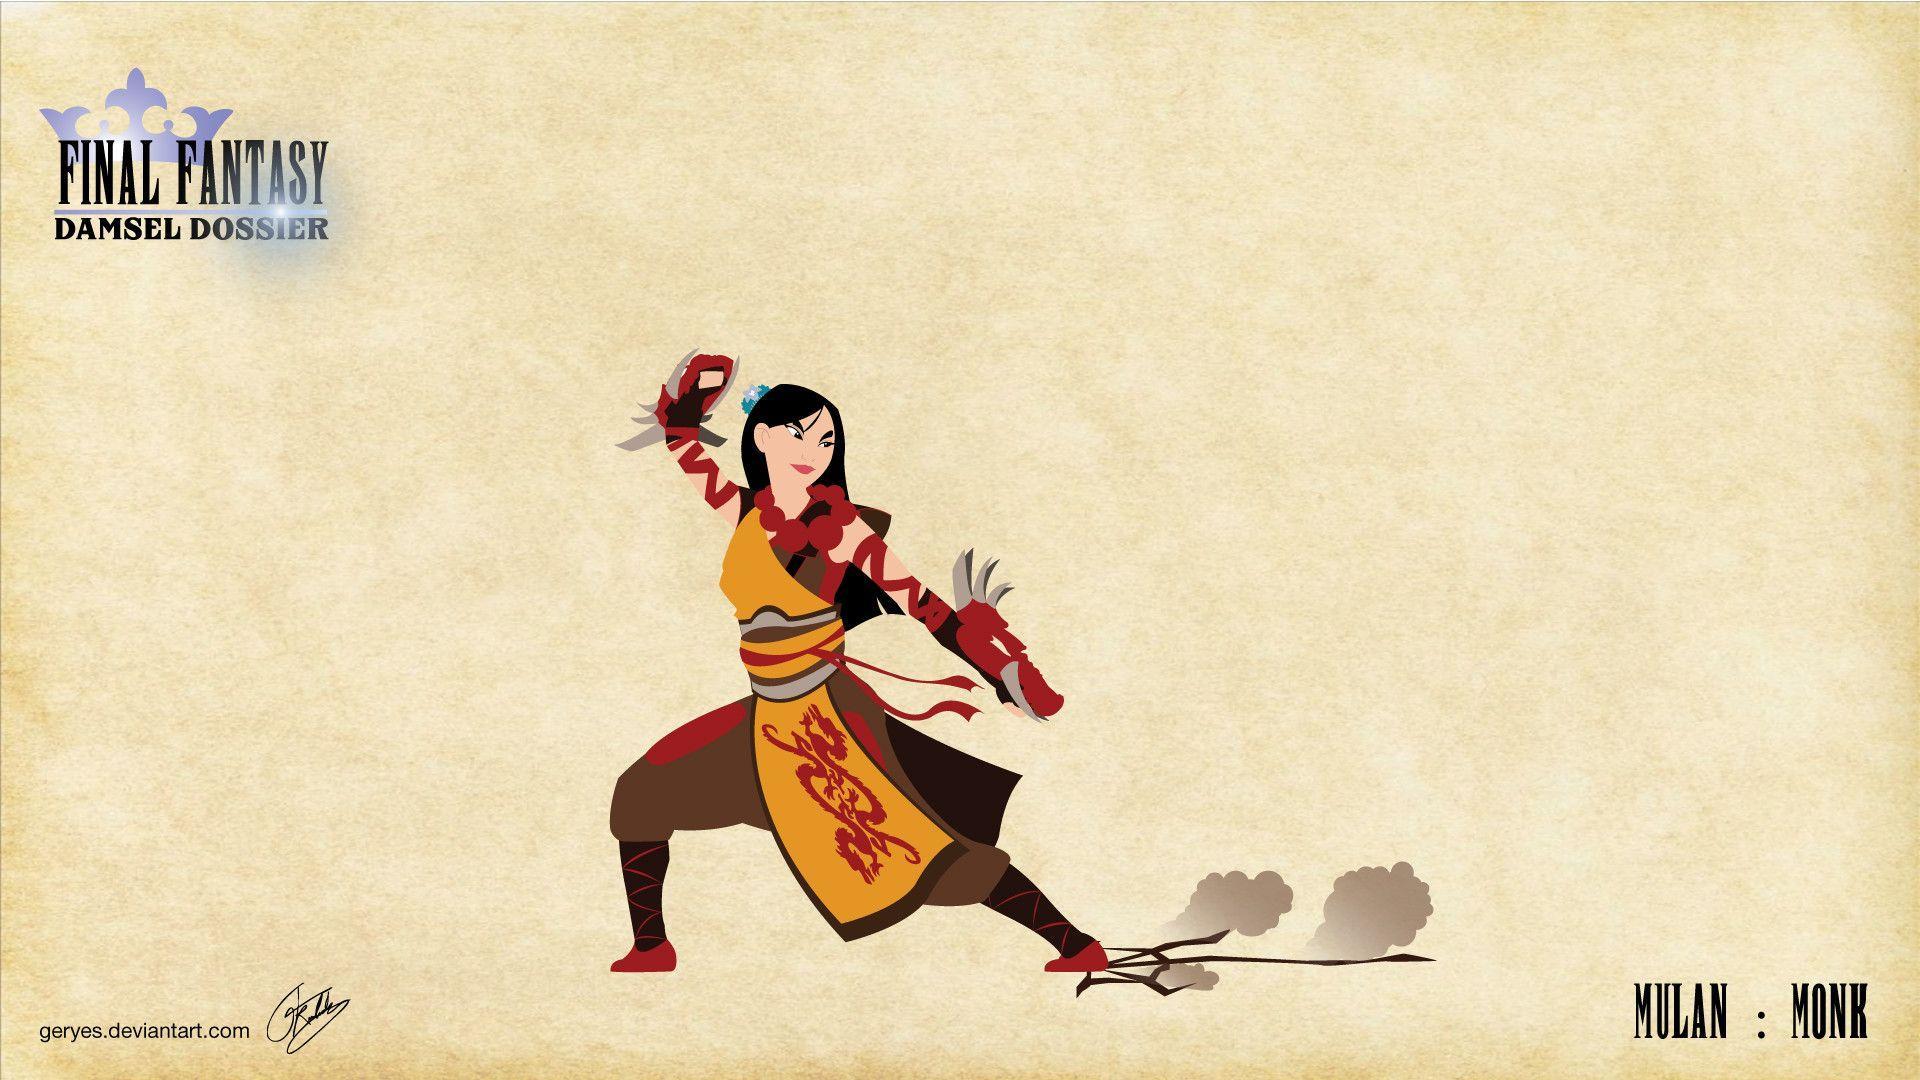 Mulan Minimalist Wallpapers Top Free Mulan Minimalist Backgrounds Wallpaperaccess